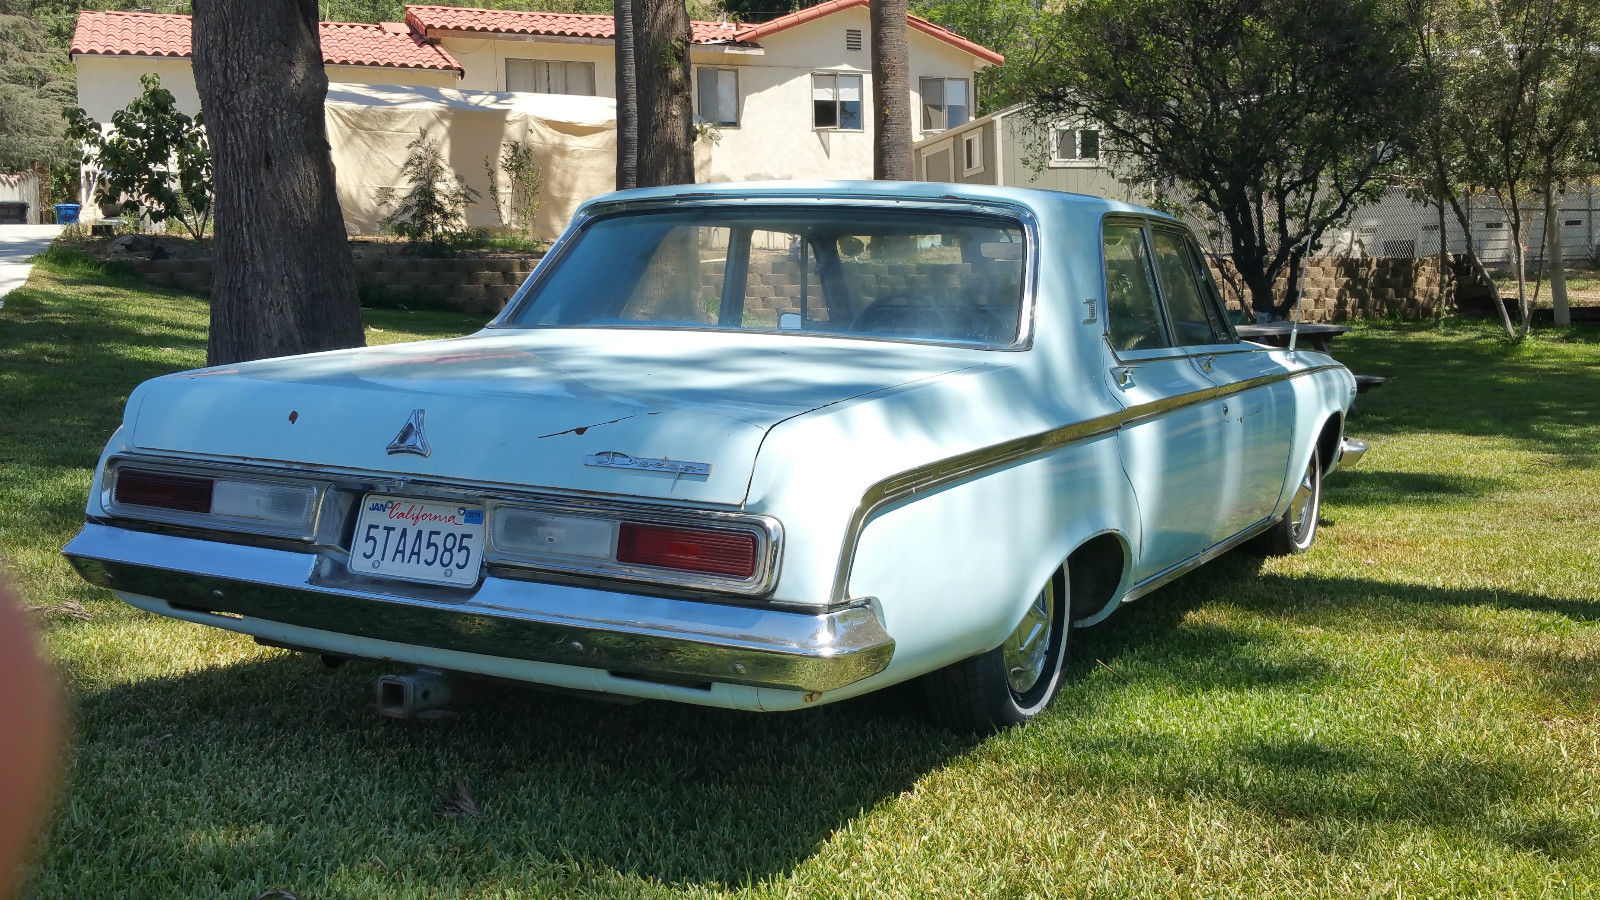 All American Classic Cars 1963 Dodge Polara 4 Door Sedan Hardtop